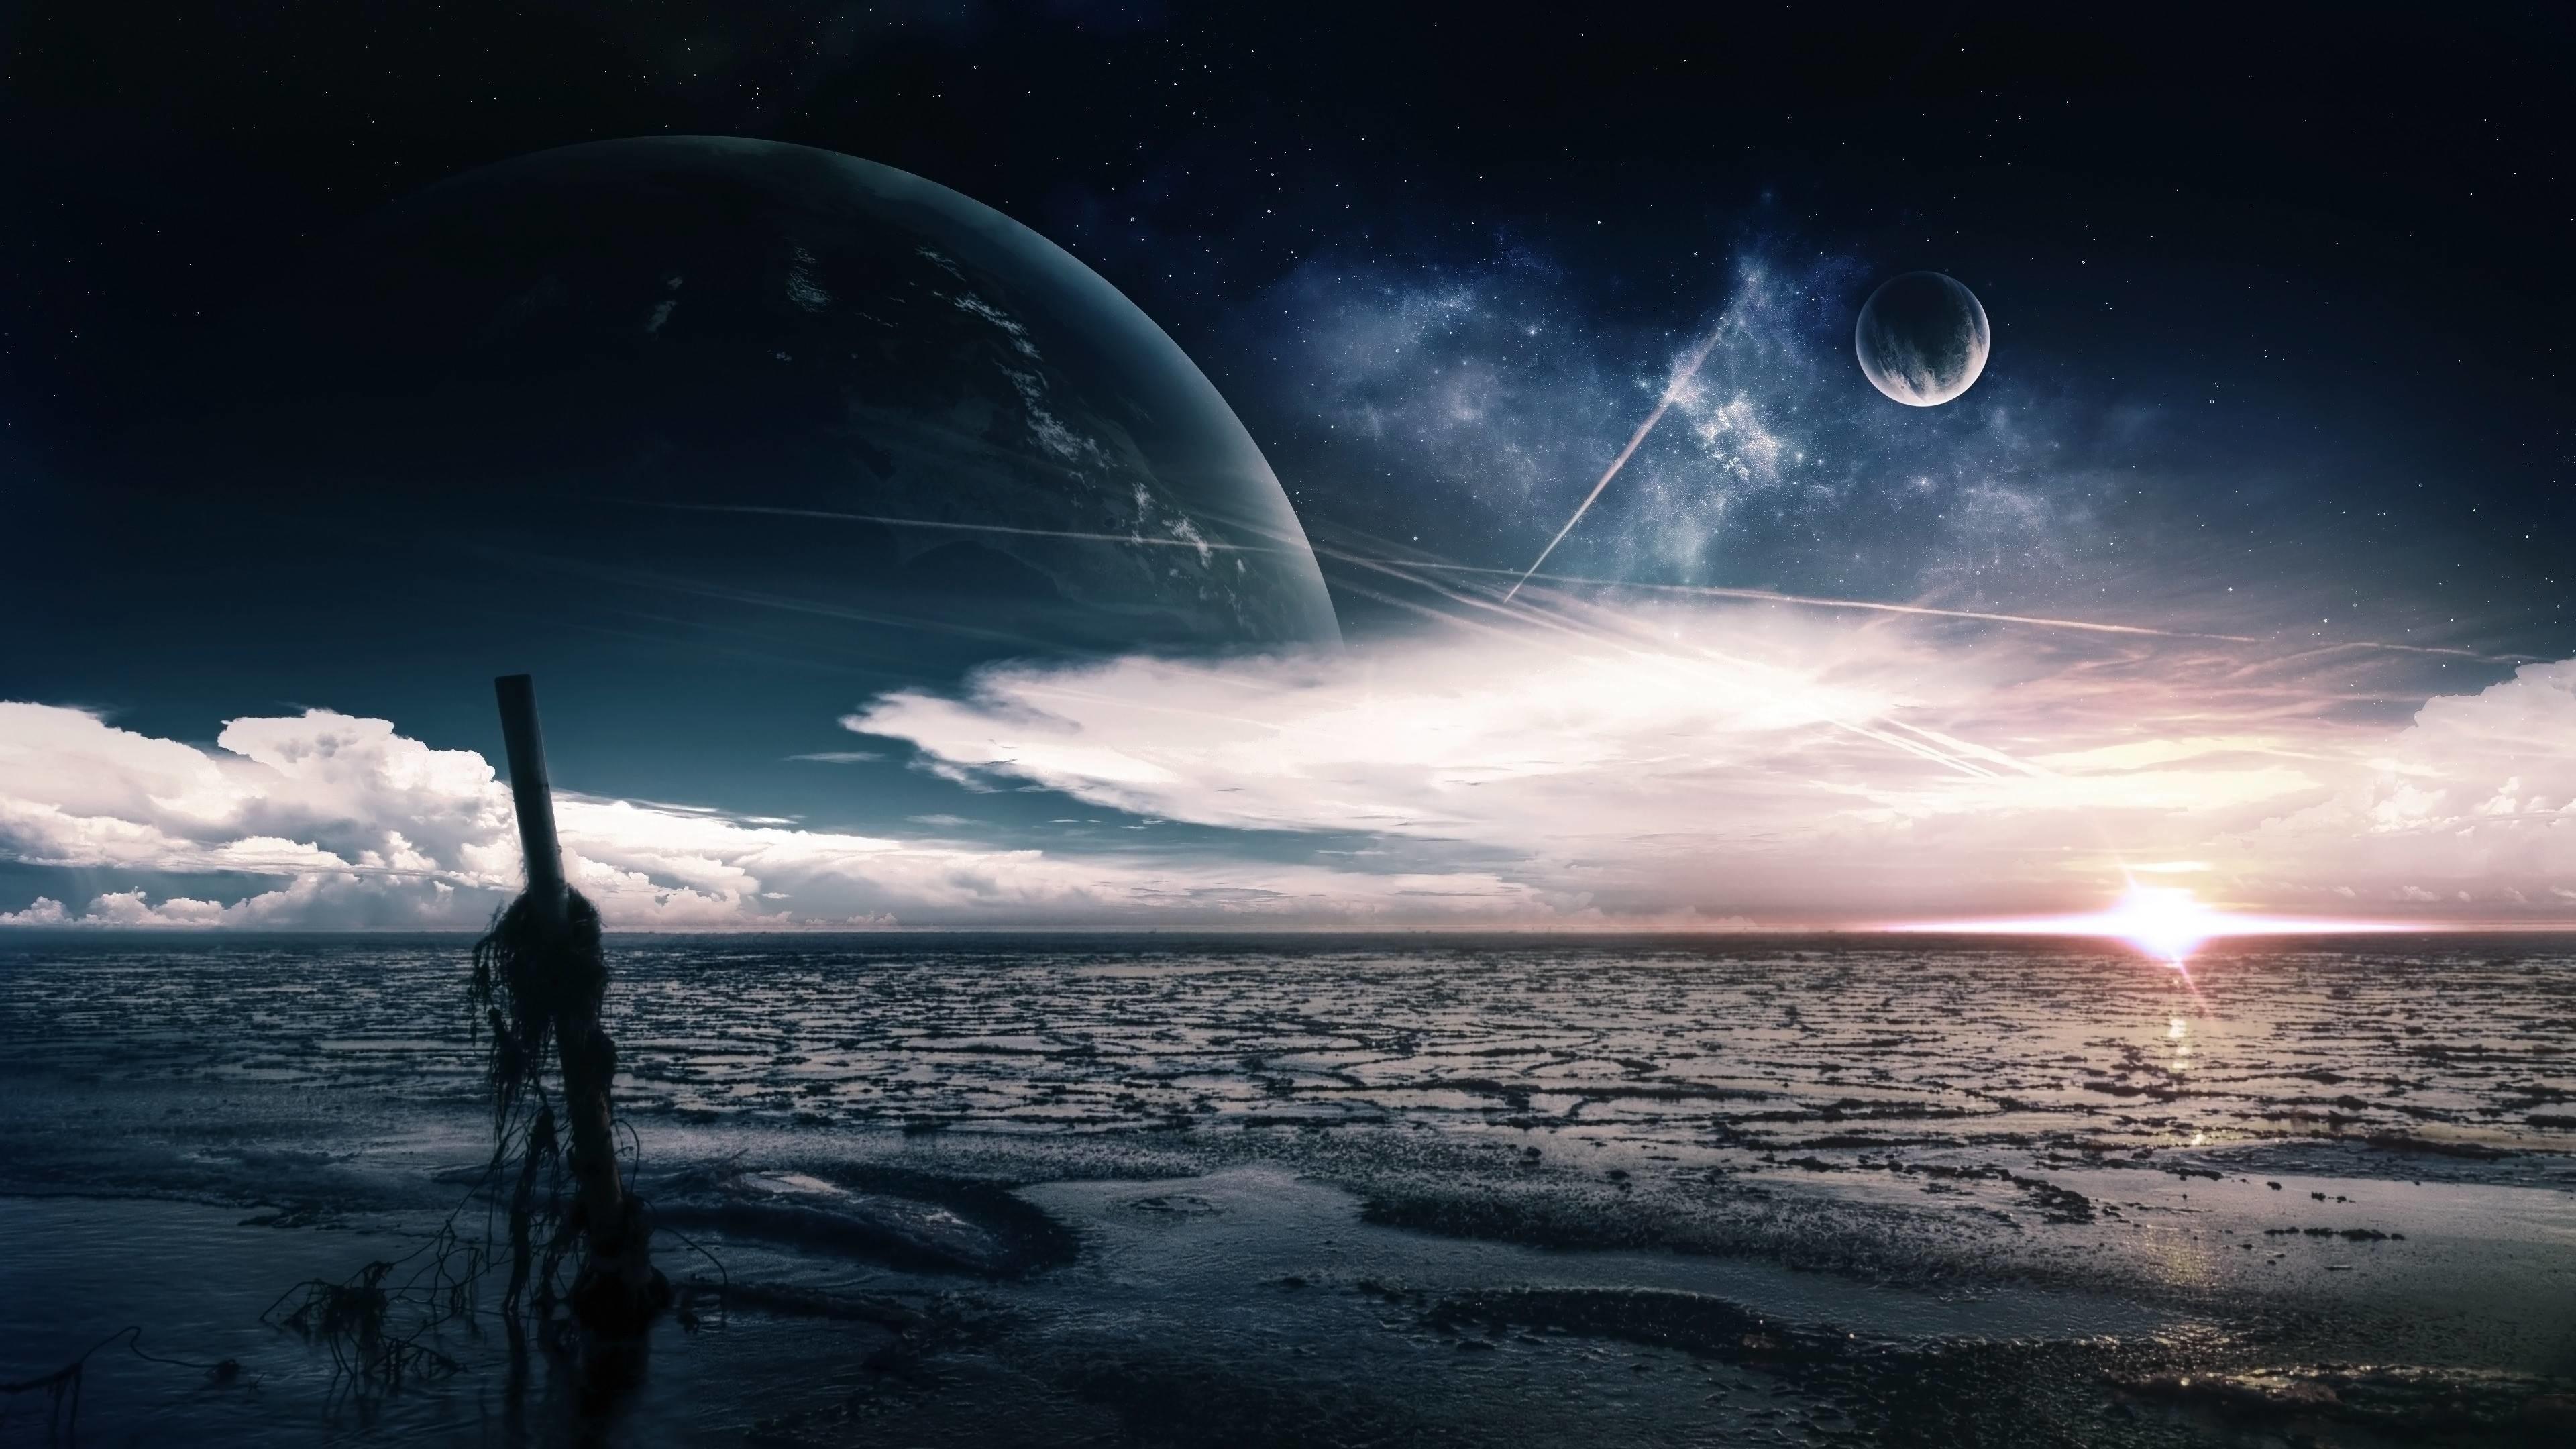 Alien Planet Wallpaper – Viewing Gallery